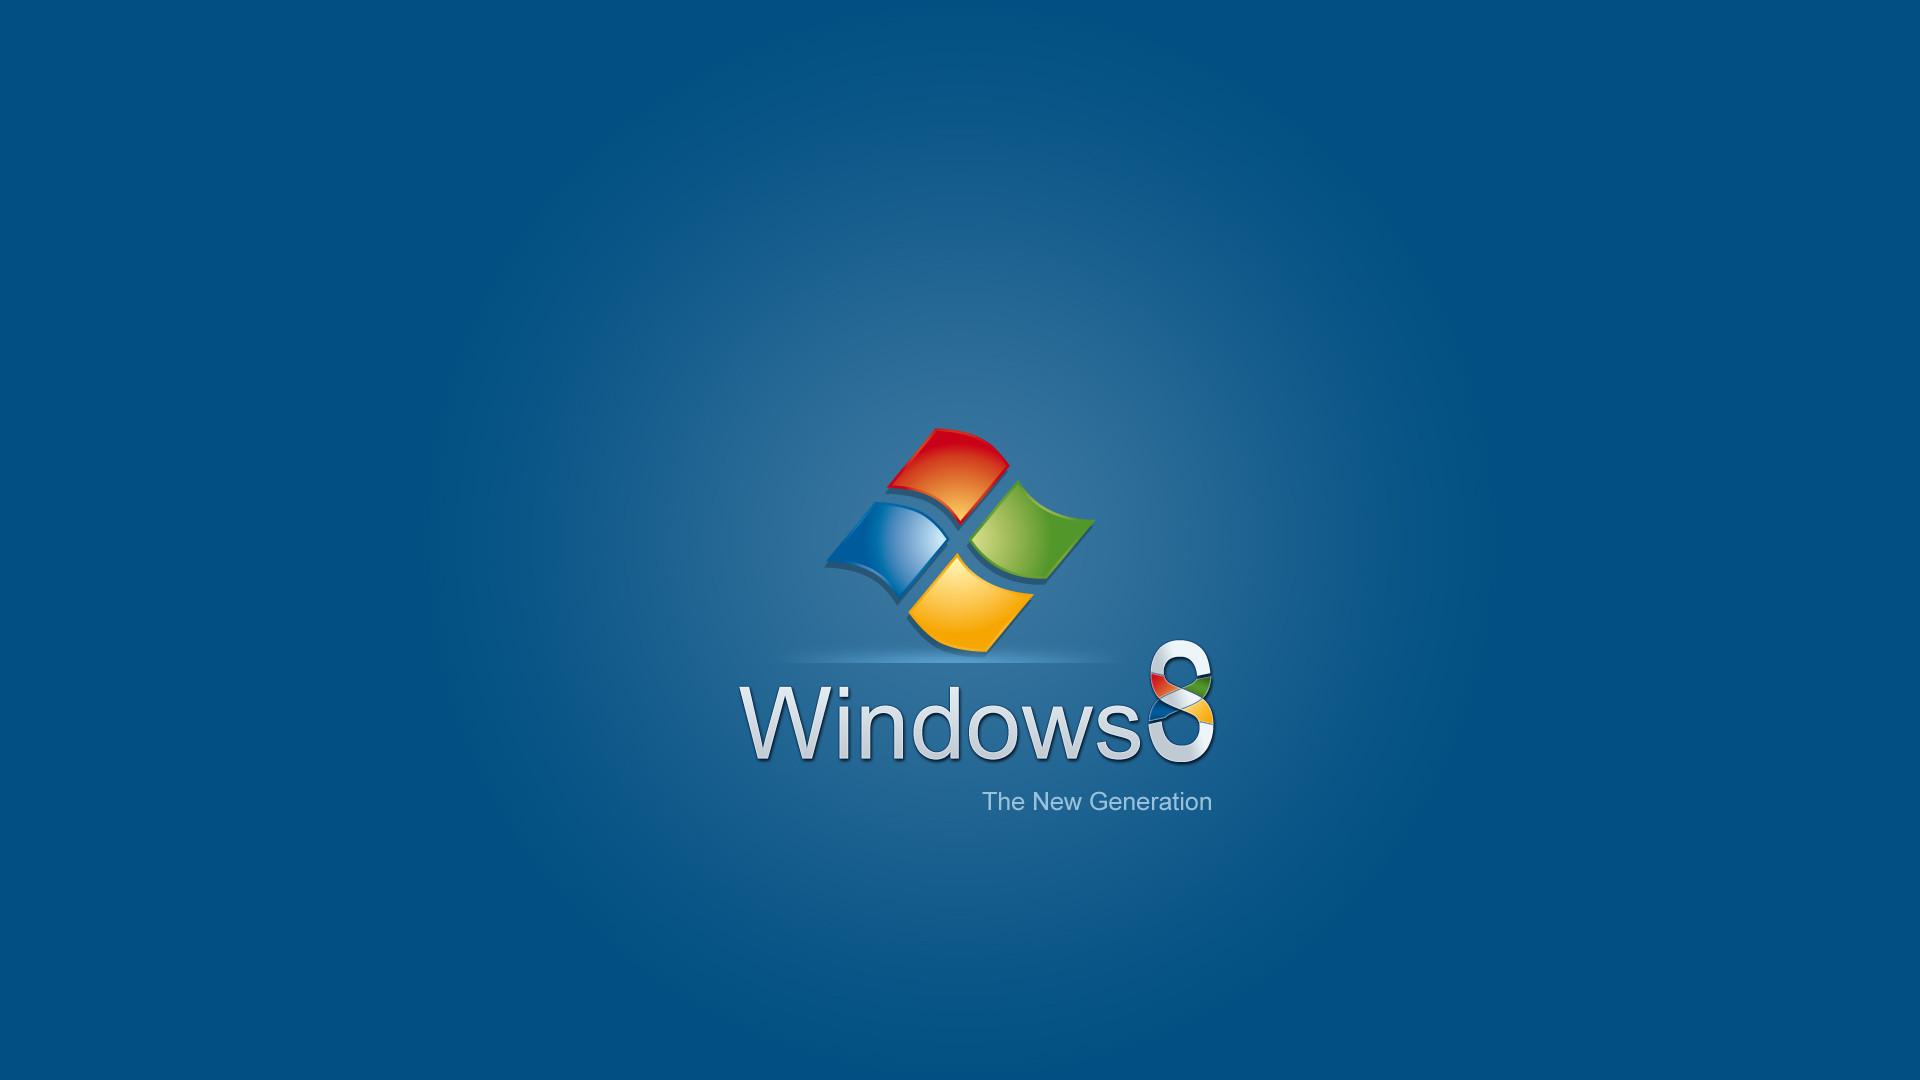 windows 8 wallpaper hd 11 Download Windows 8 Wallpapers HD